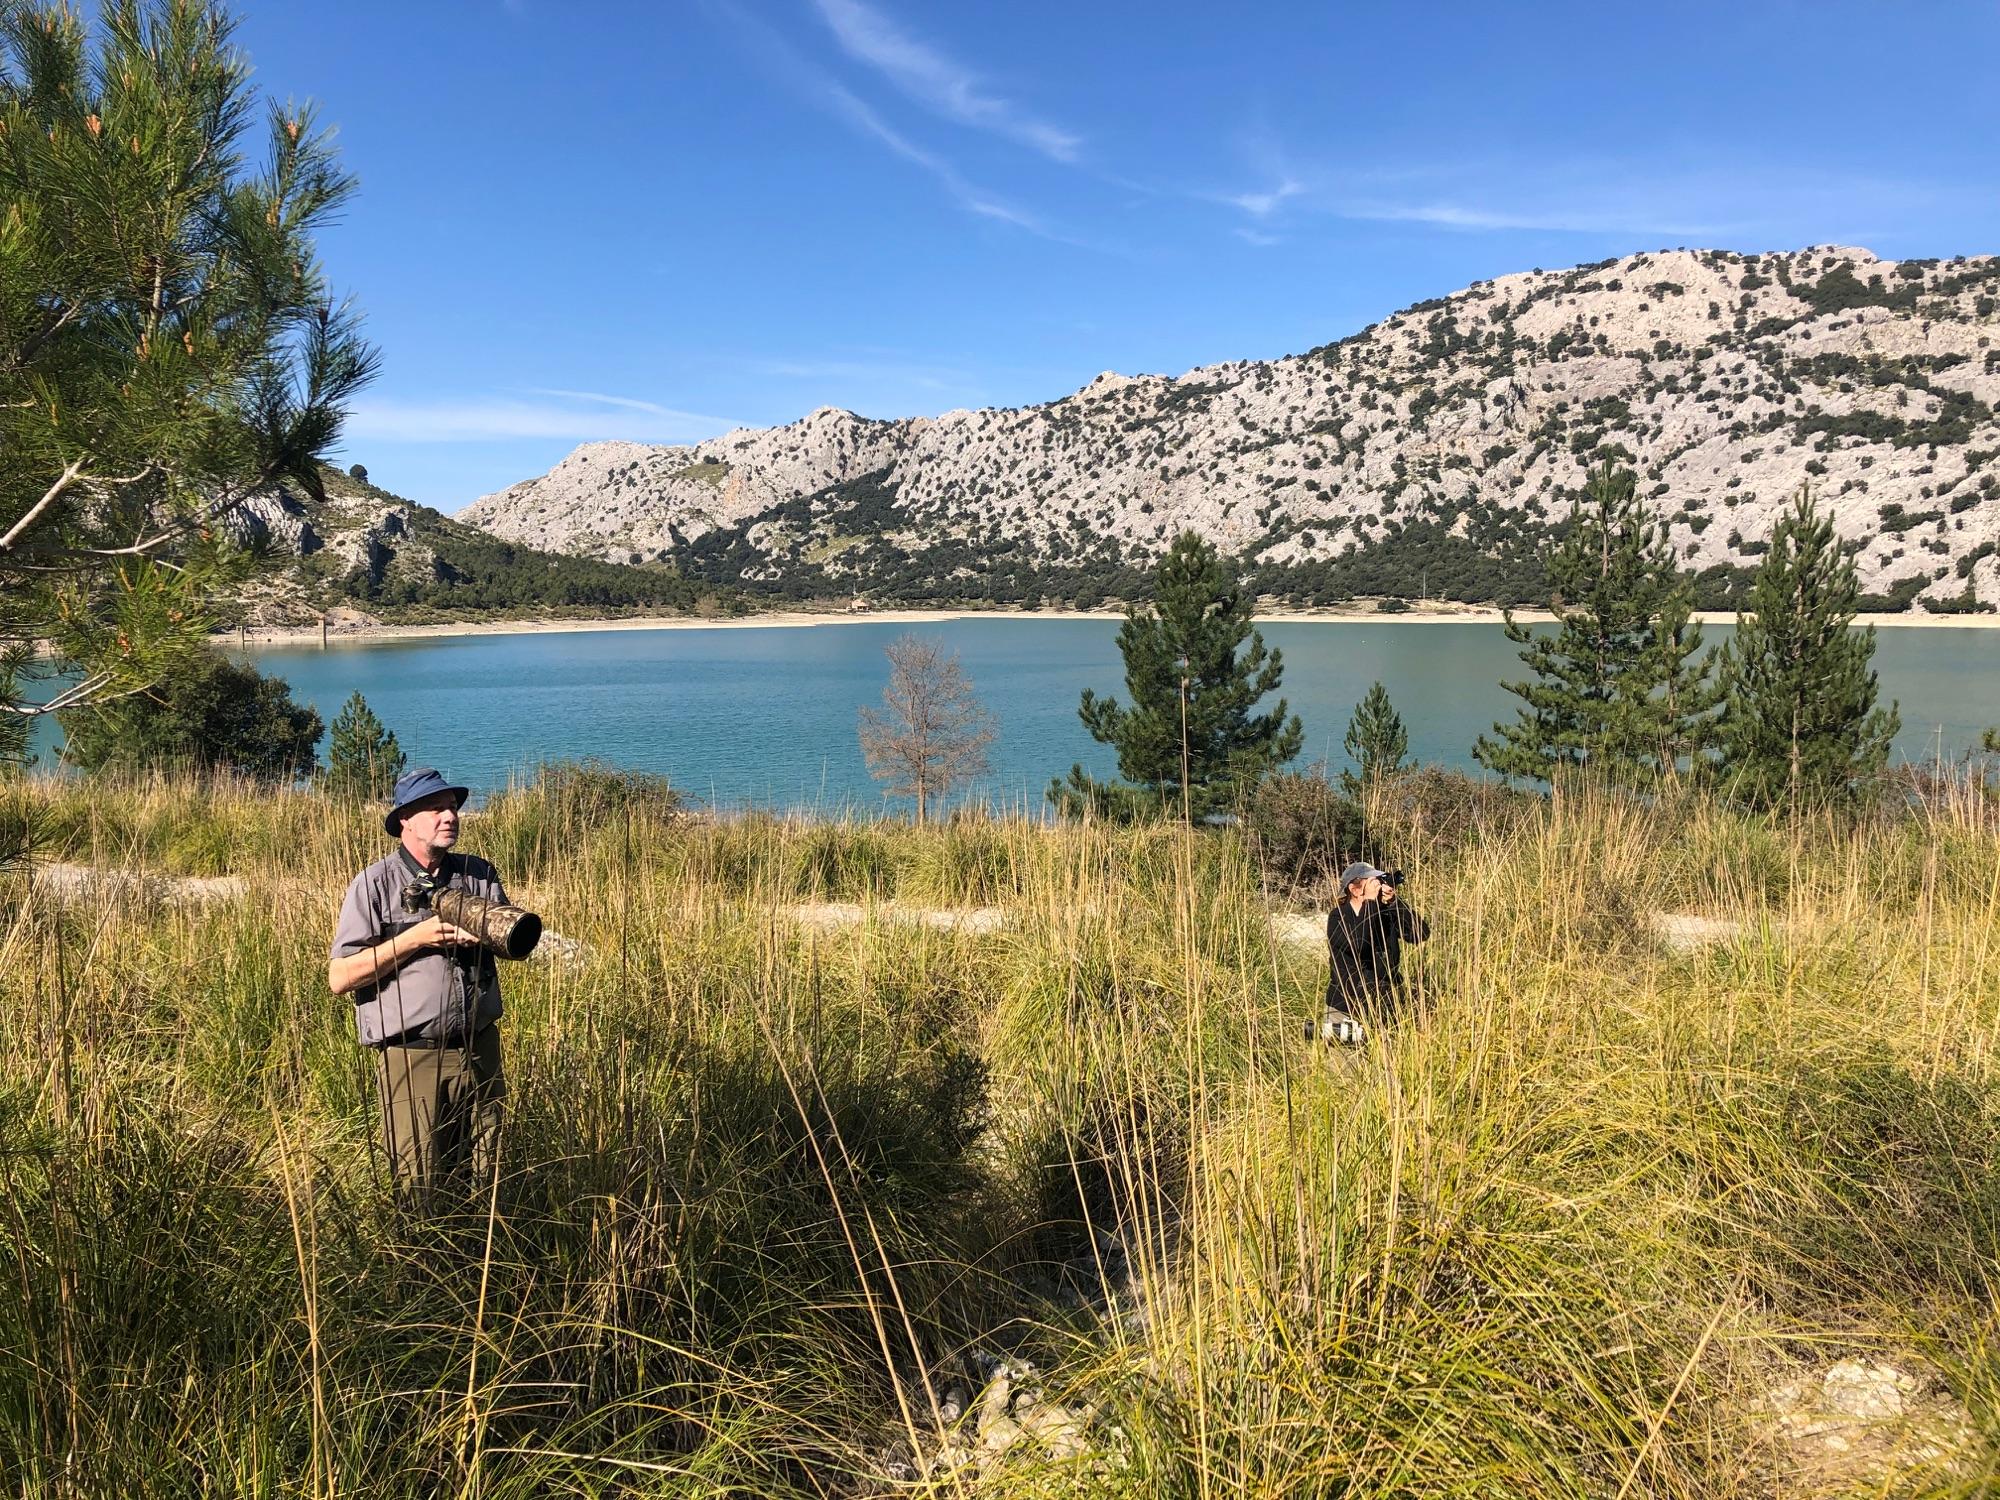 Birding at Cuber Reservoir